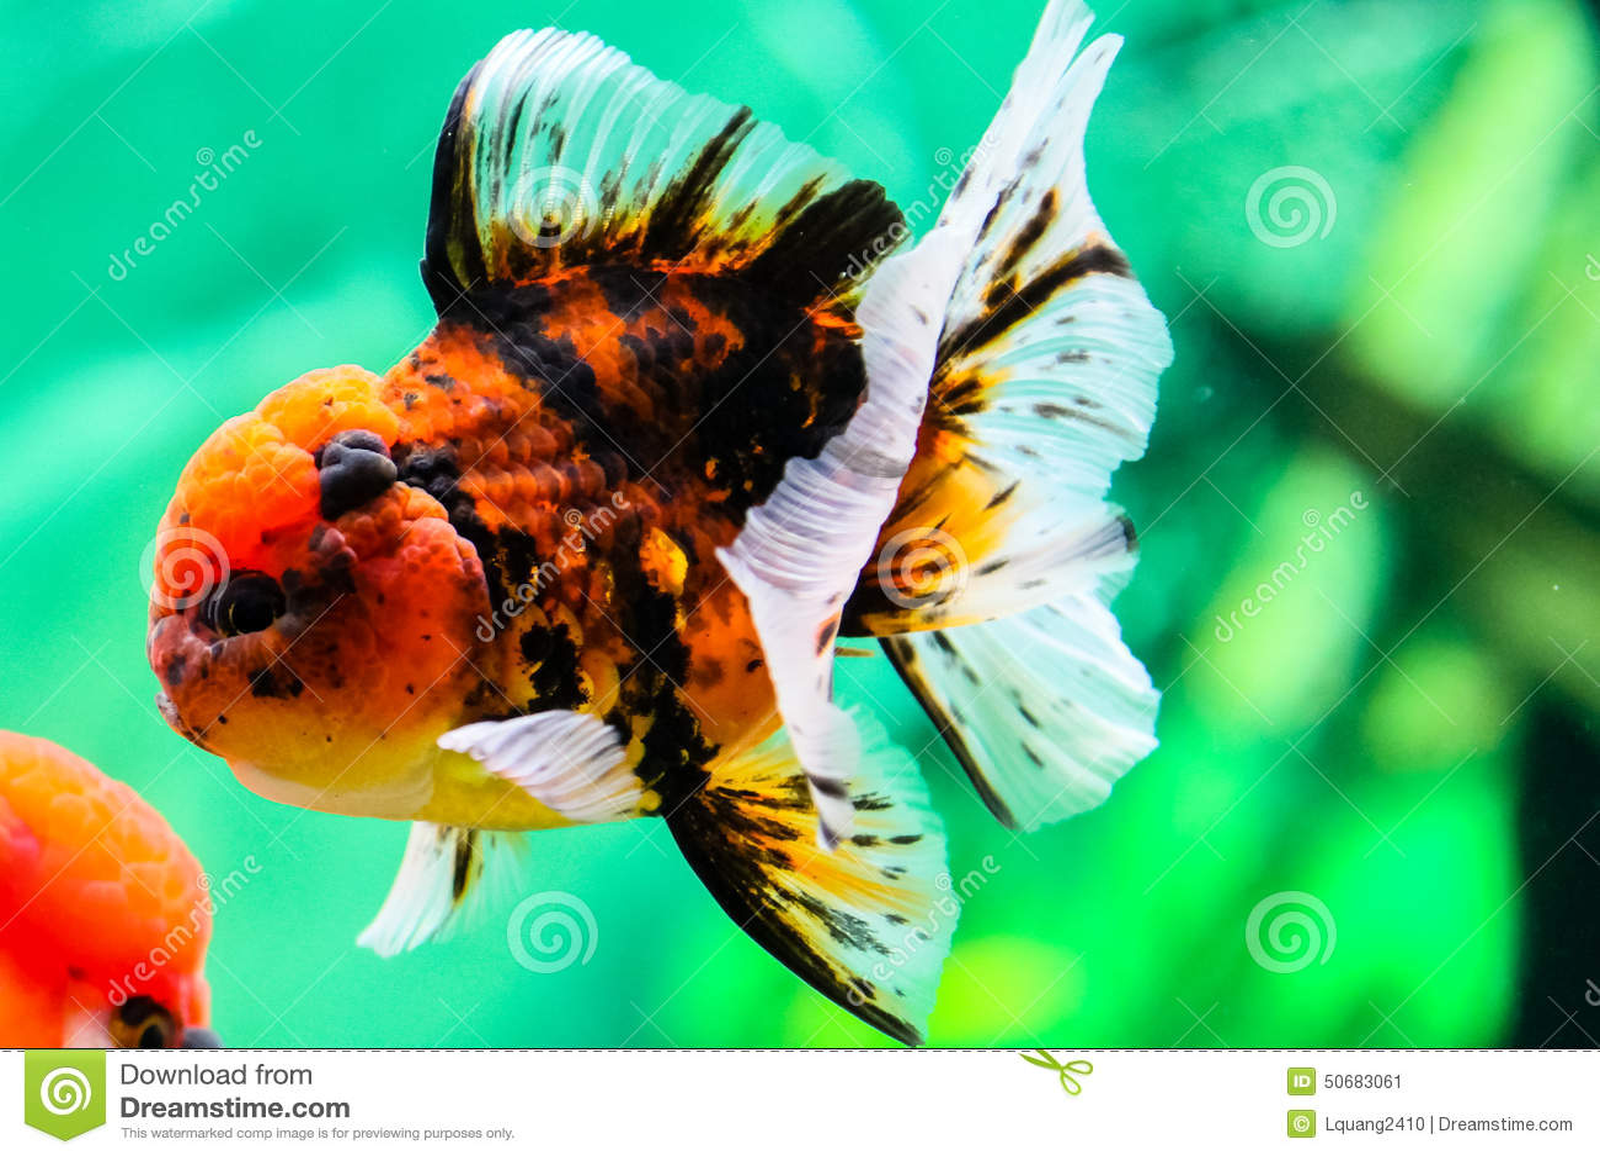 Download 关闭在水族馆的金鱼 库存图片. 图片 包括有 概念性, 宏指令, 宠物, 下落, 飞翅, 特写镜头, 橙色 - 50683061